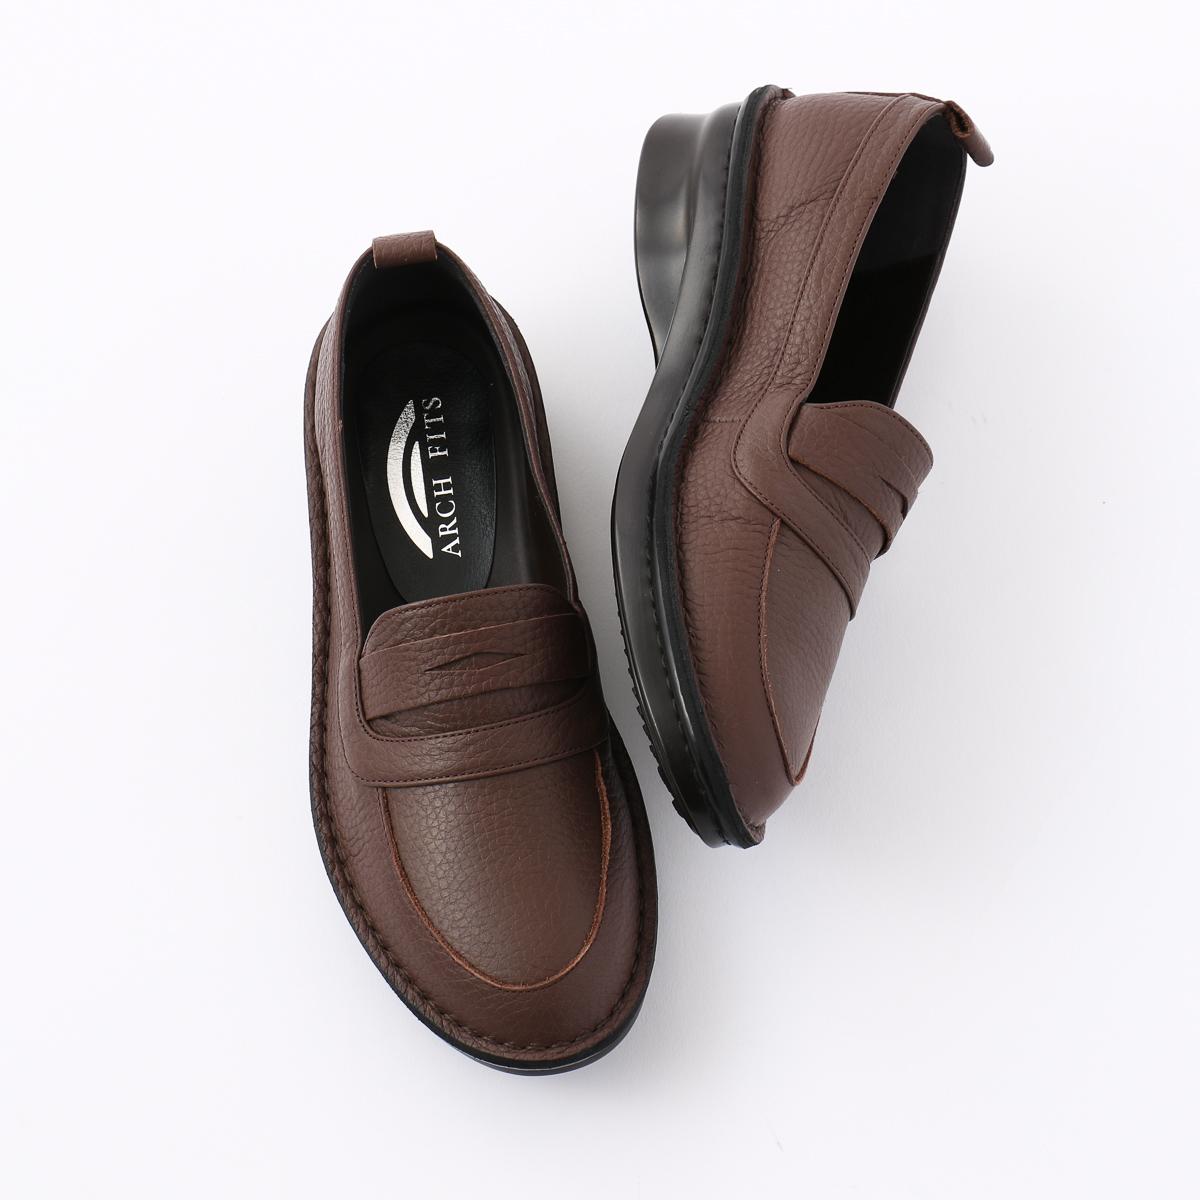 【30%OFF】[ARCH FITS] アーチフィッツ ふかふか ローファーシューズ 婦人靴 レディースシューズ 外反母趾対応 日本製 本革 幅広 送料無料 手作り